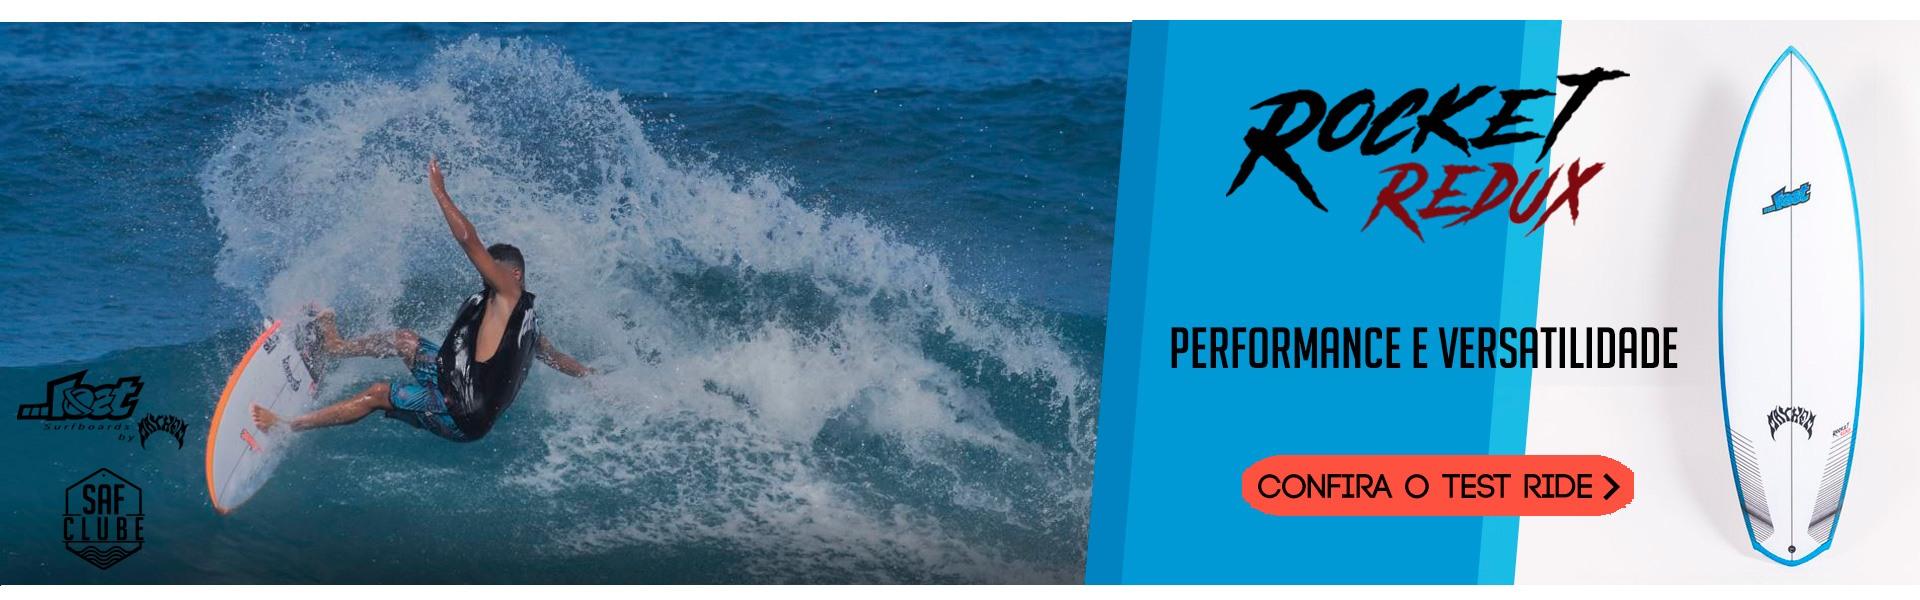 Prancha de Surf Lost Rocket Redux